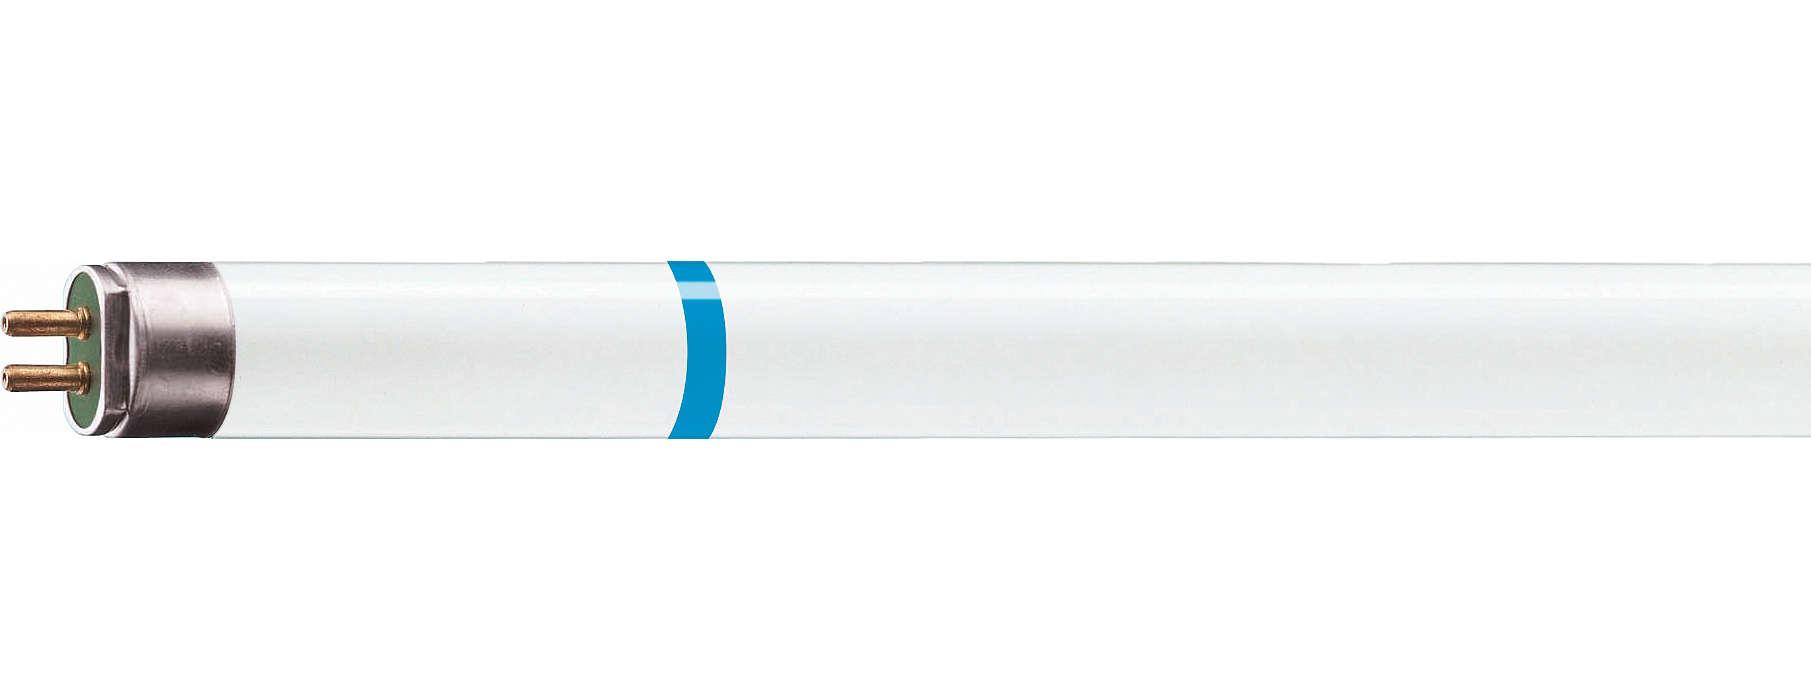 MASTER TL5 Υψηλής Φωτεινής Ροής Secura